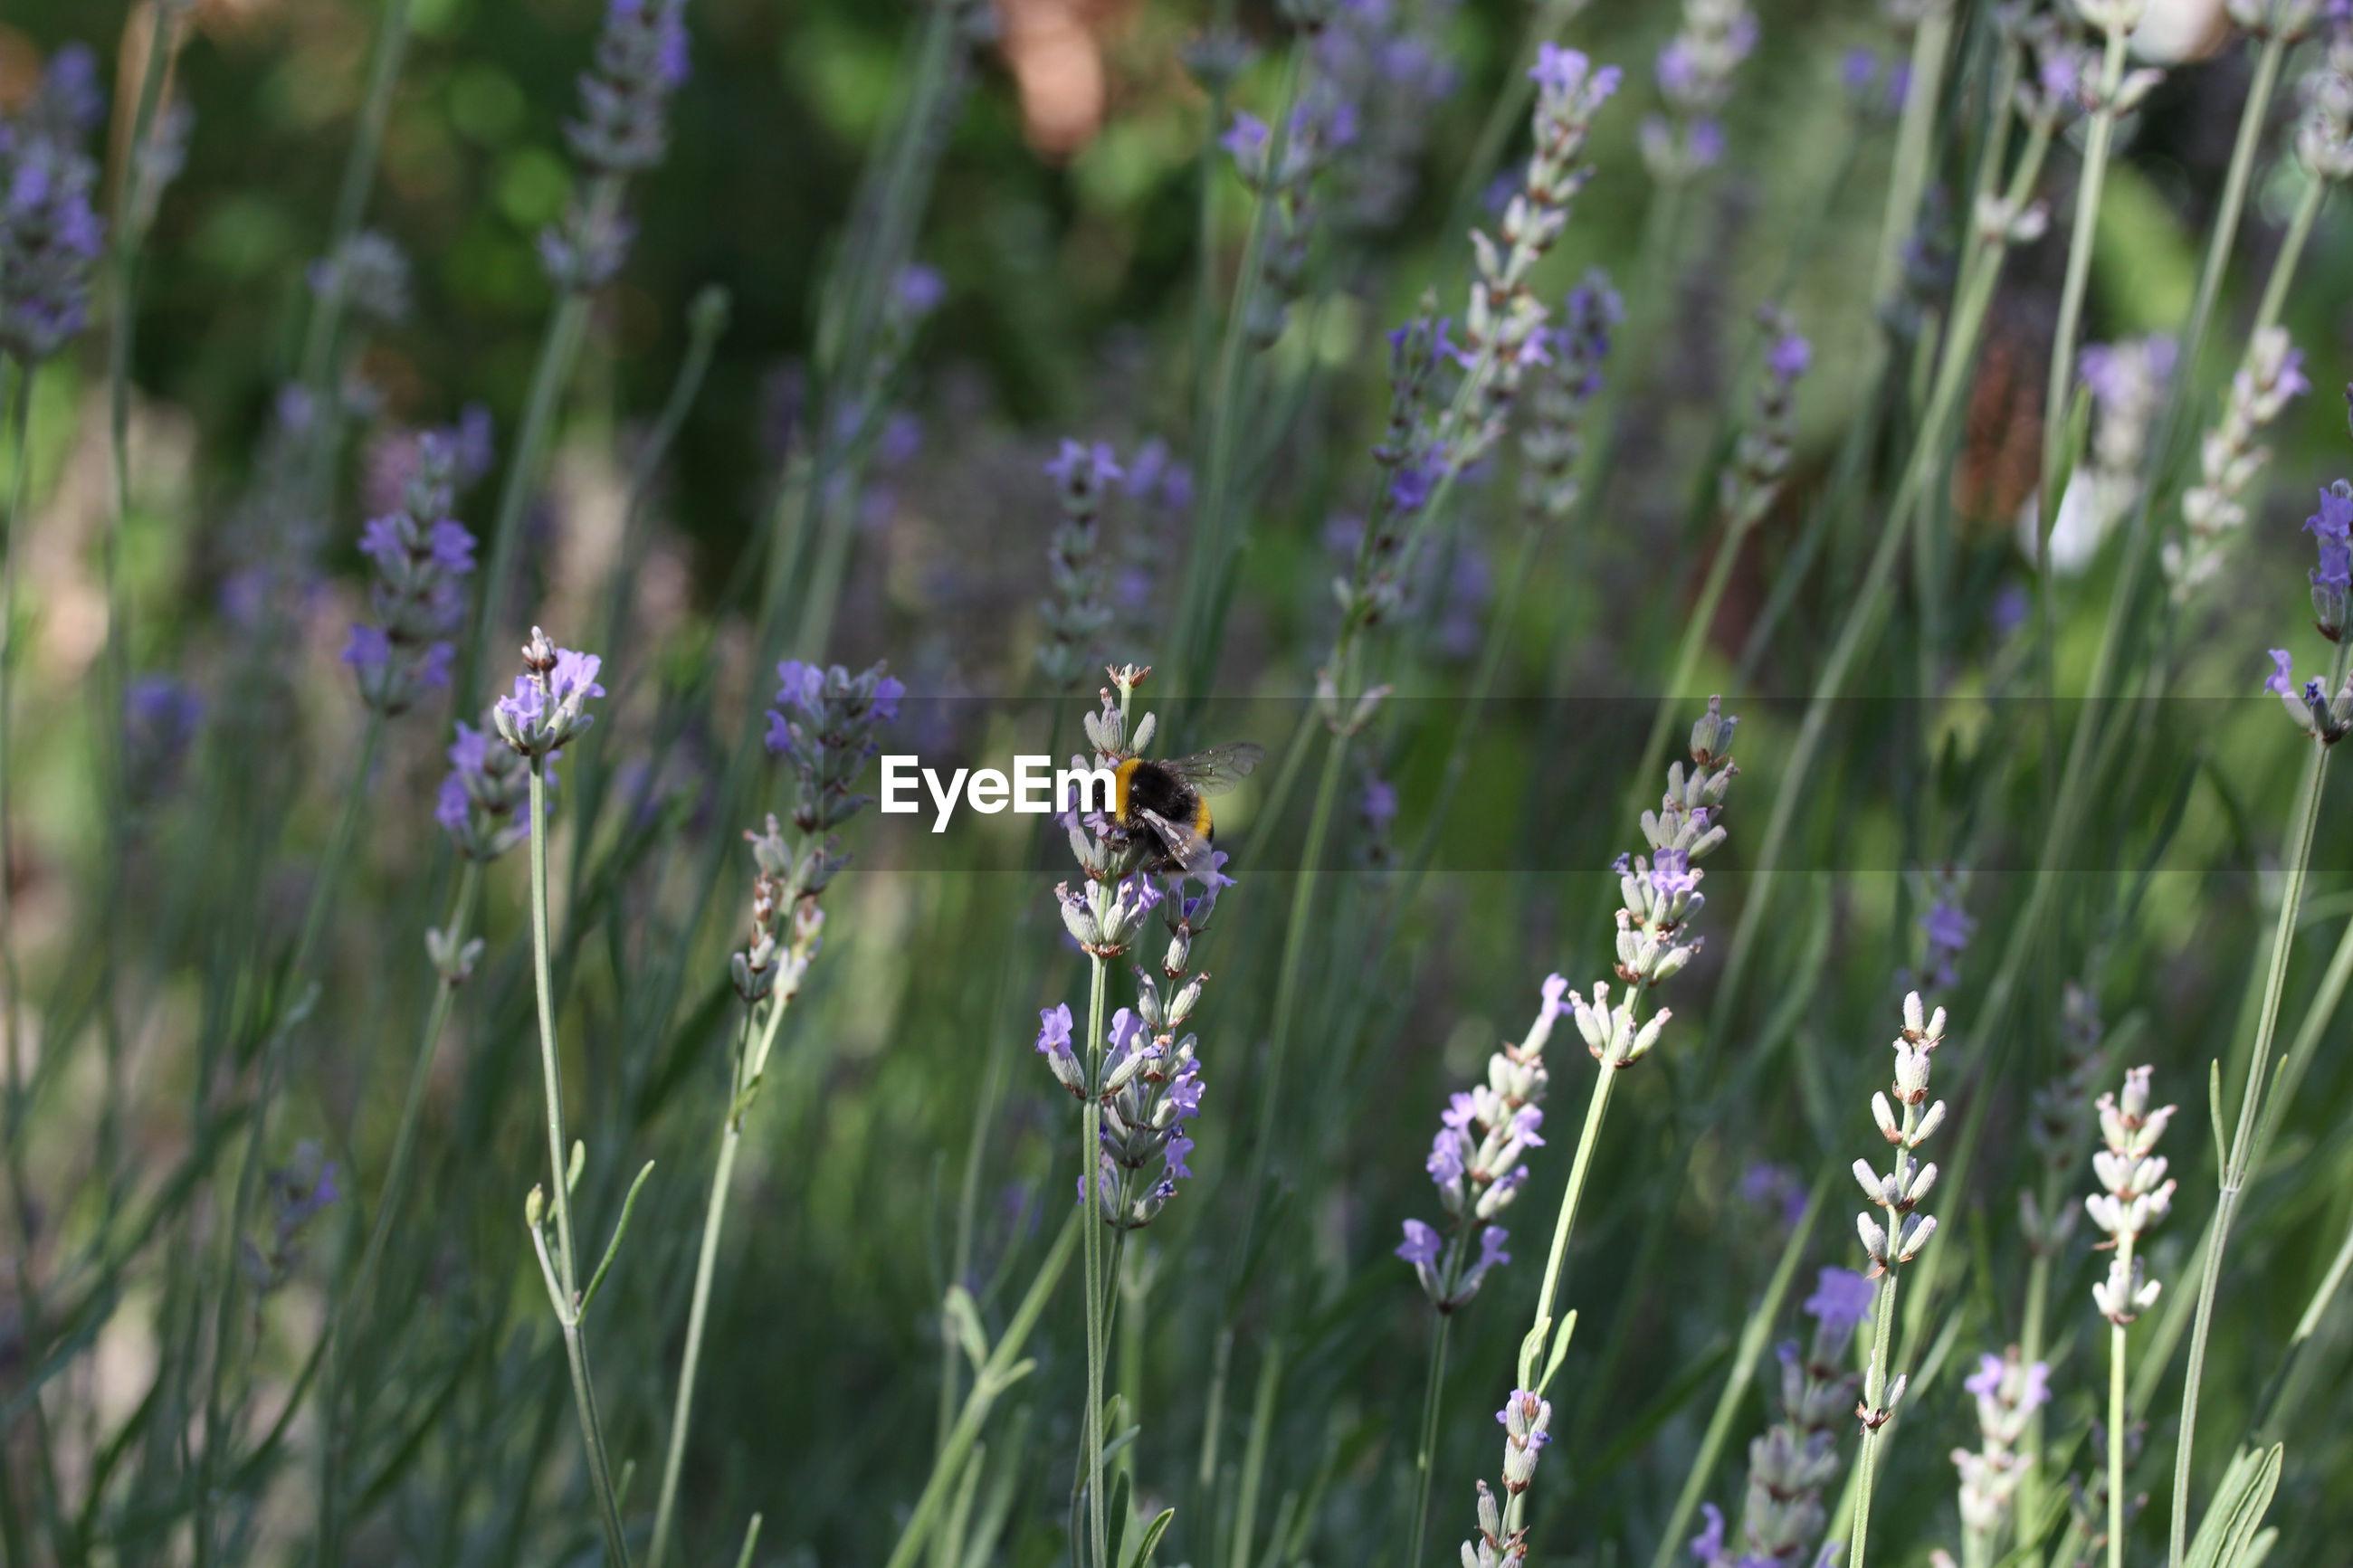 Bee pollinating on purple flowering plant